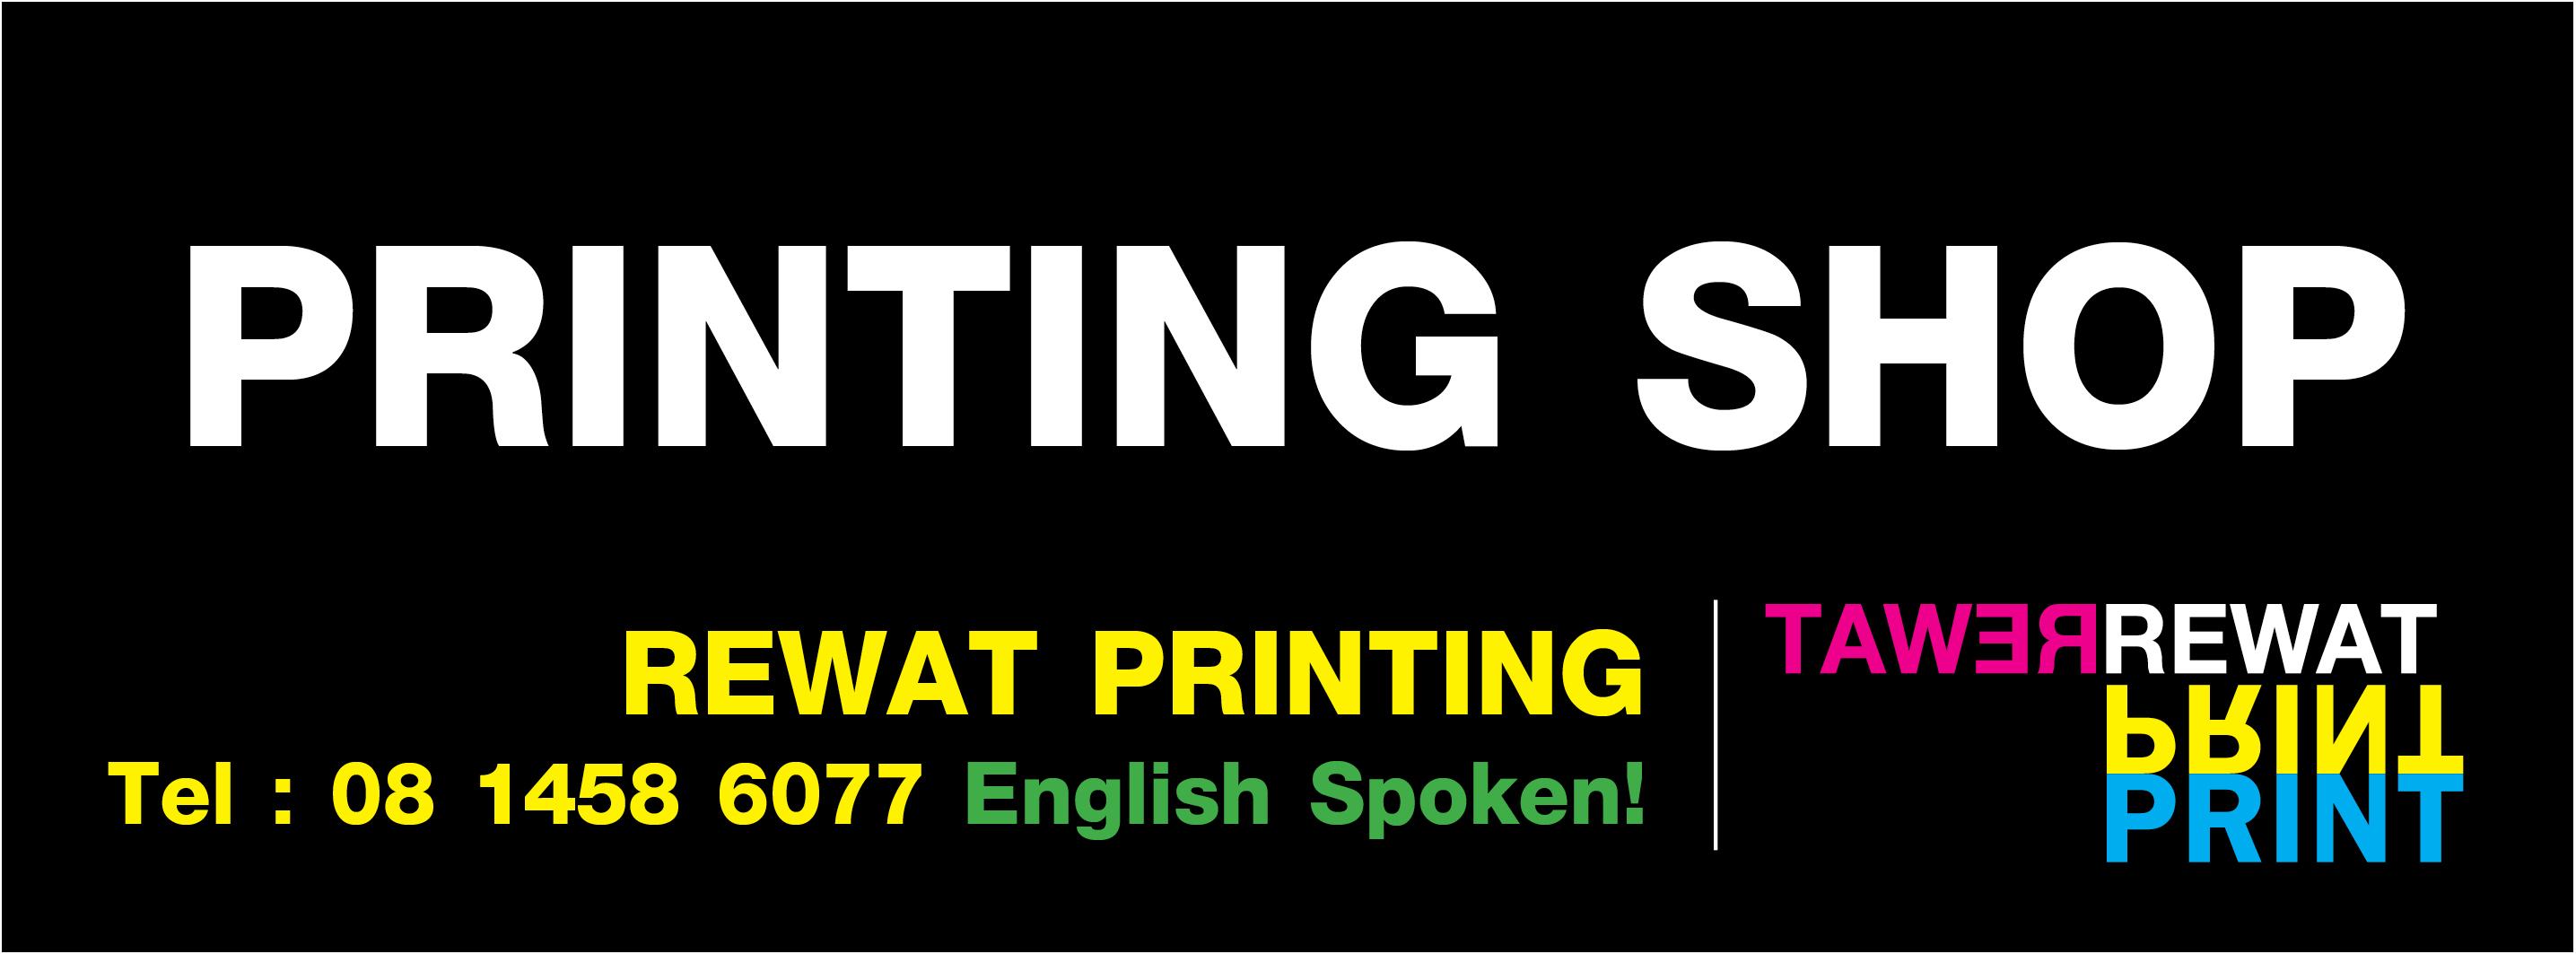 rewat printing ad buriram times